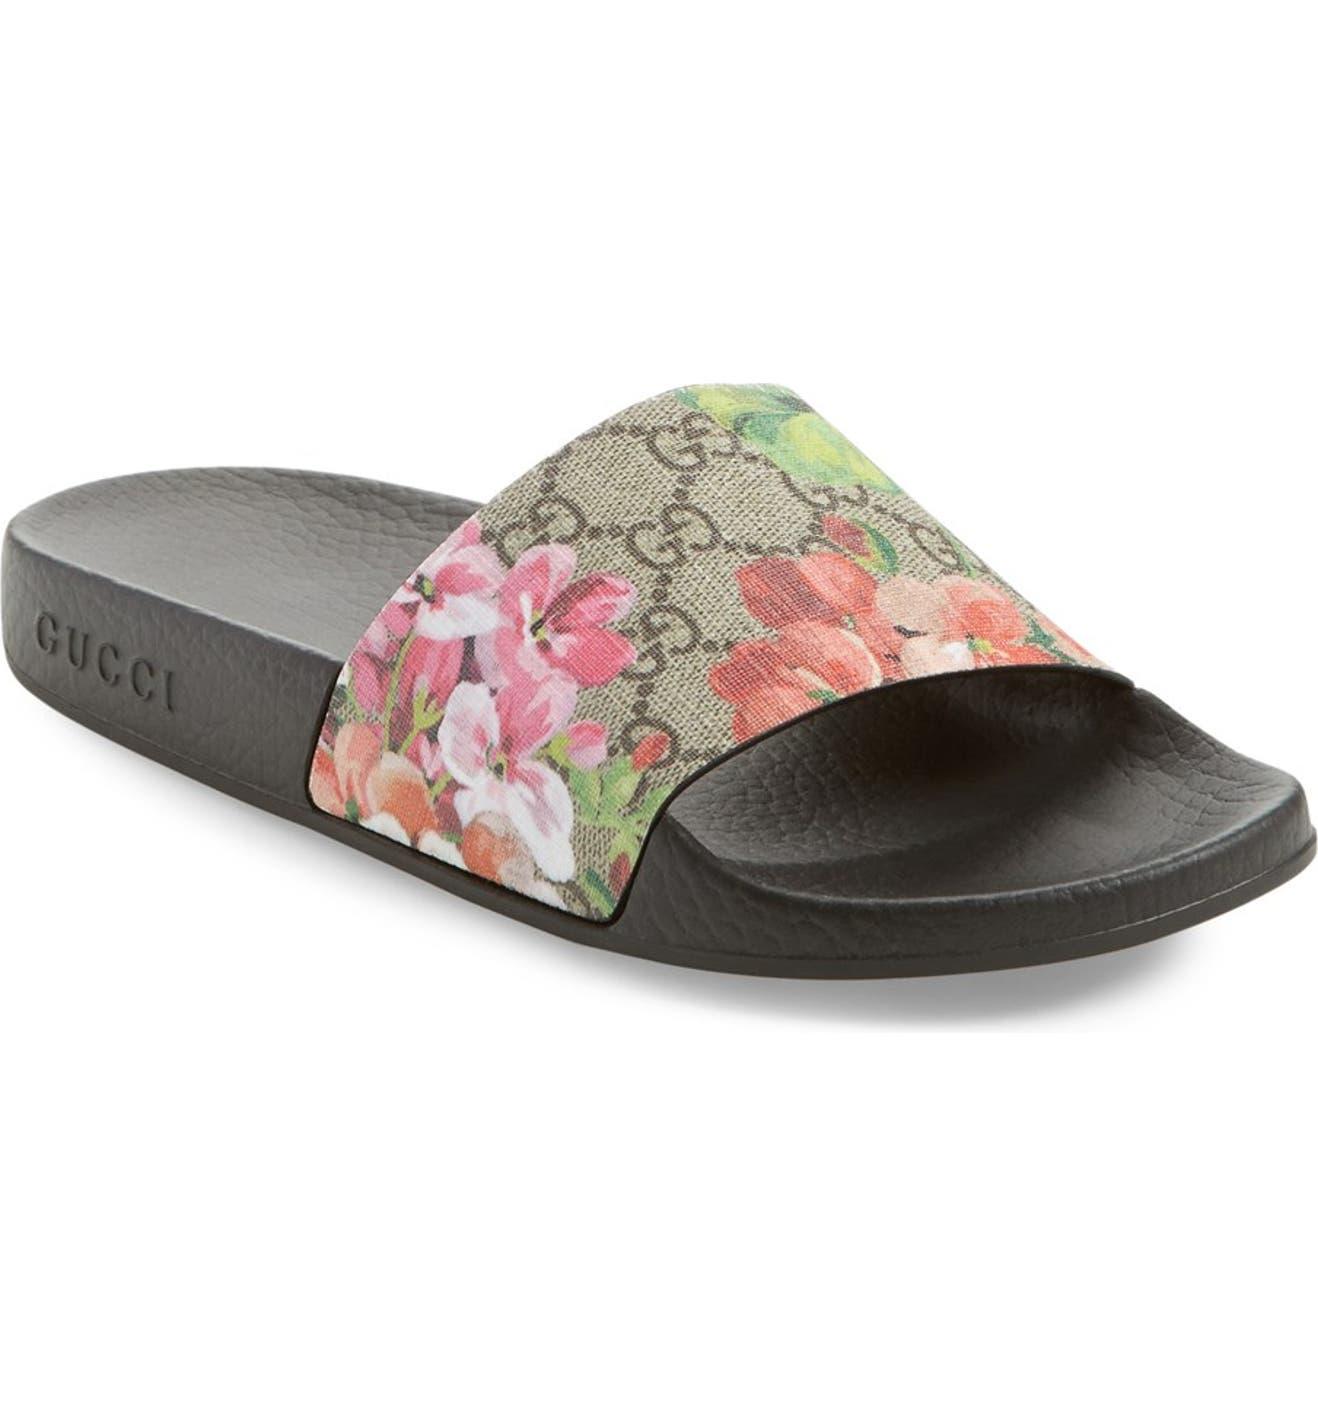 7660c7af1bc1 Gucci Pursuit Slide Sandal (Women)